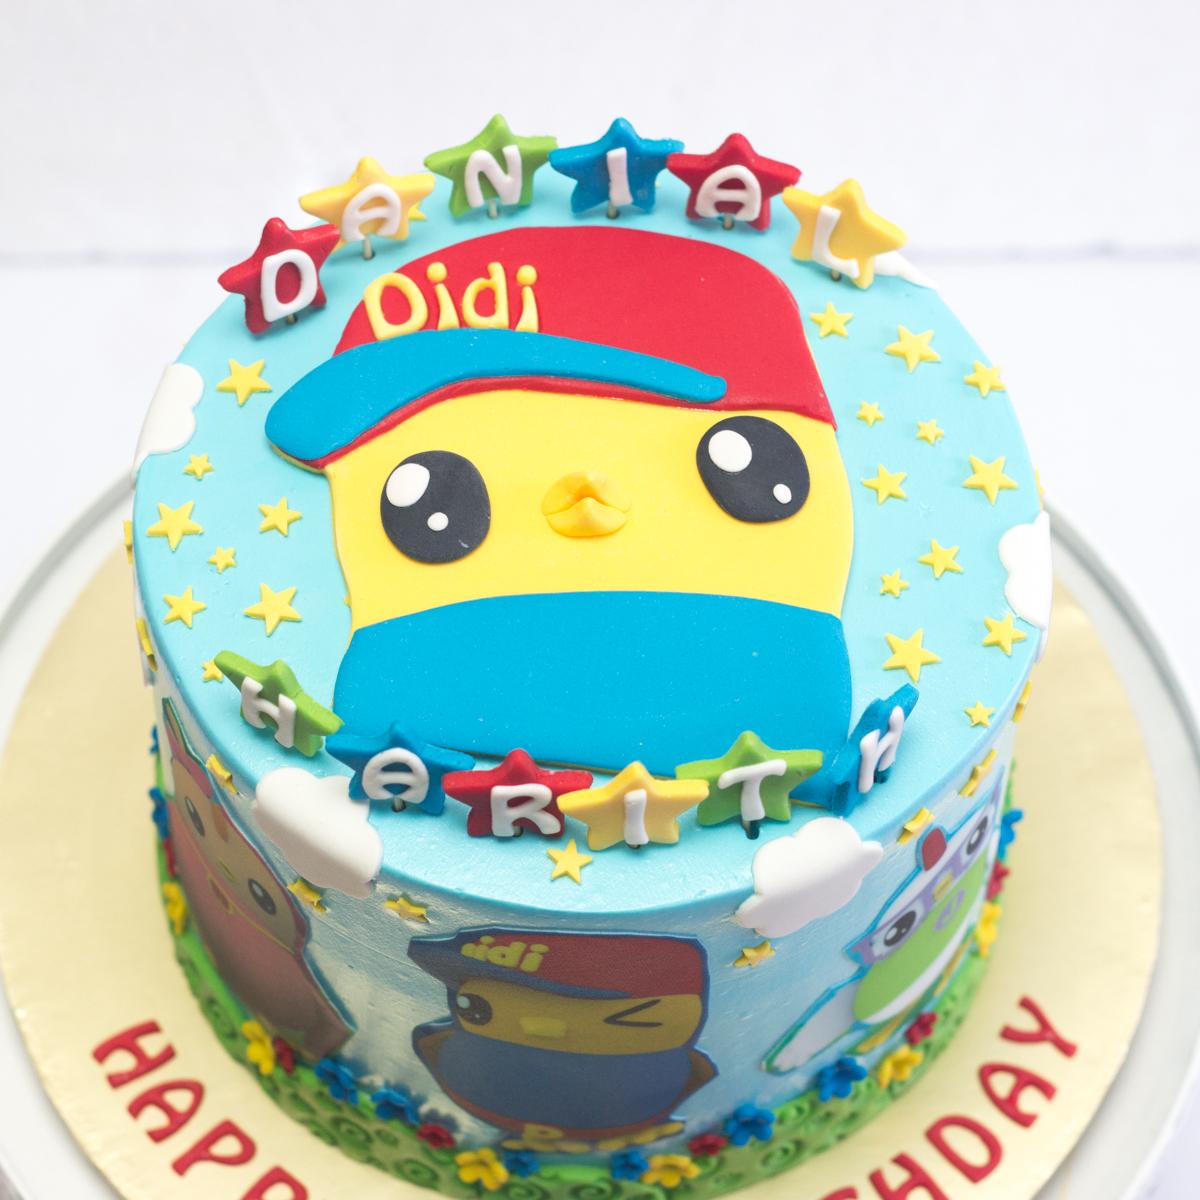 Cake Images For Didi : Lynn BabyCakes: December 2016